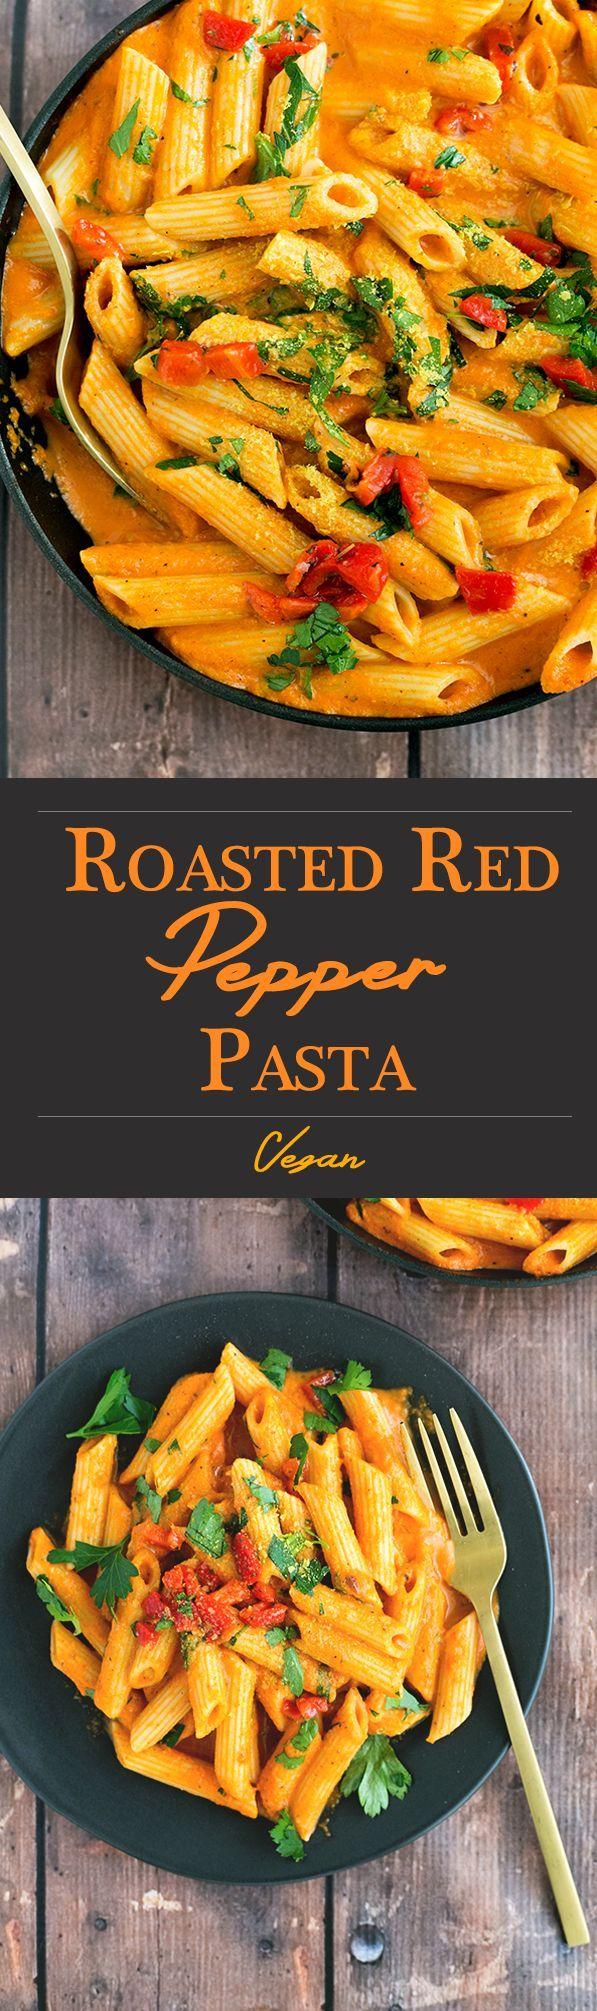 Vegane Pasta - Cremig, Gesund und Lecker *** Healthy, Delicious and Simple to make Roasted Red Pepper Pasta. Vegan & Glutenfree Option, Made in under 20 minutes.